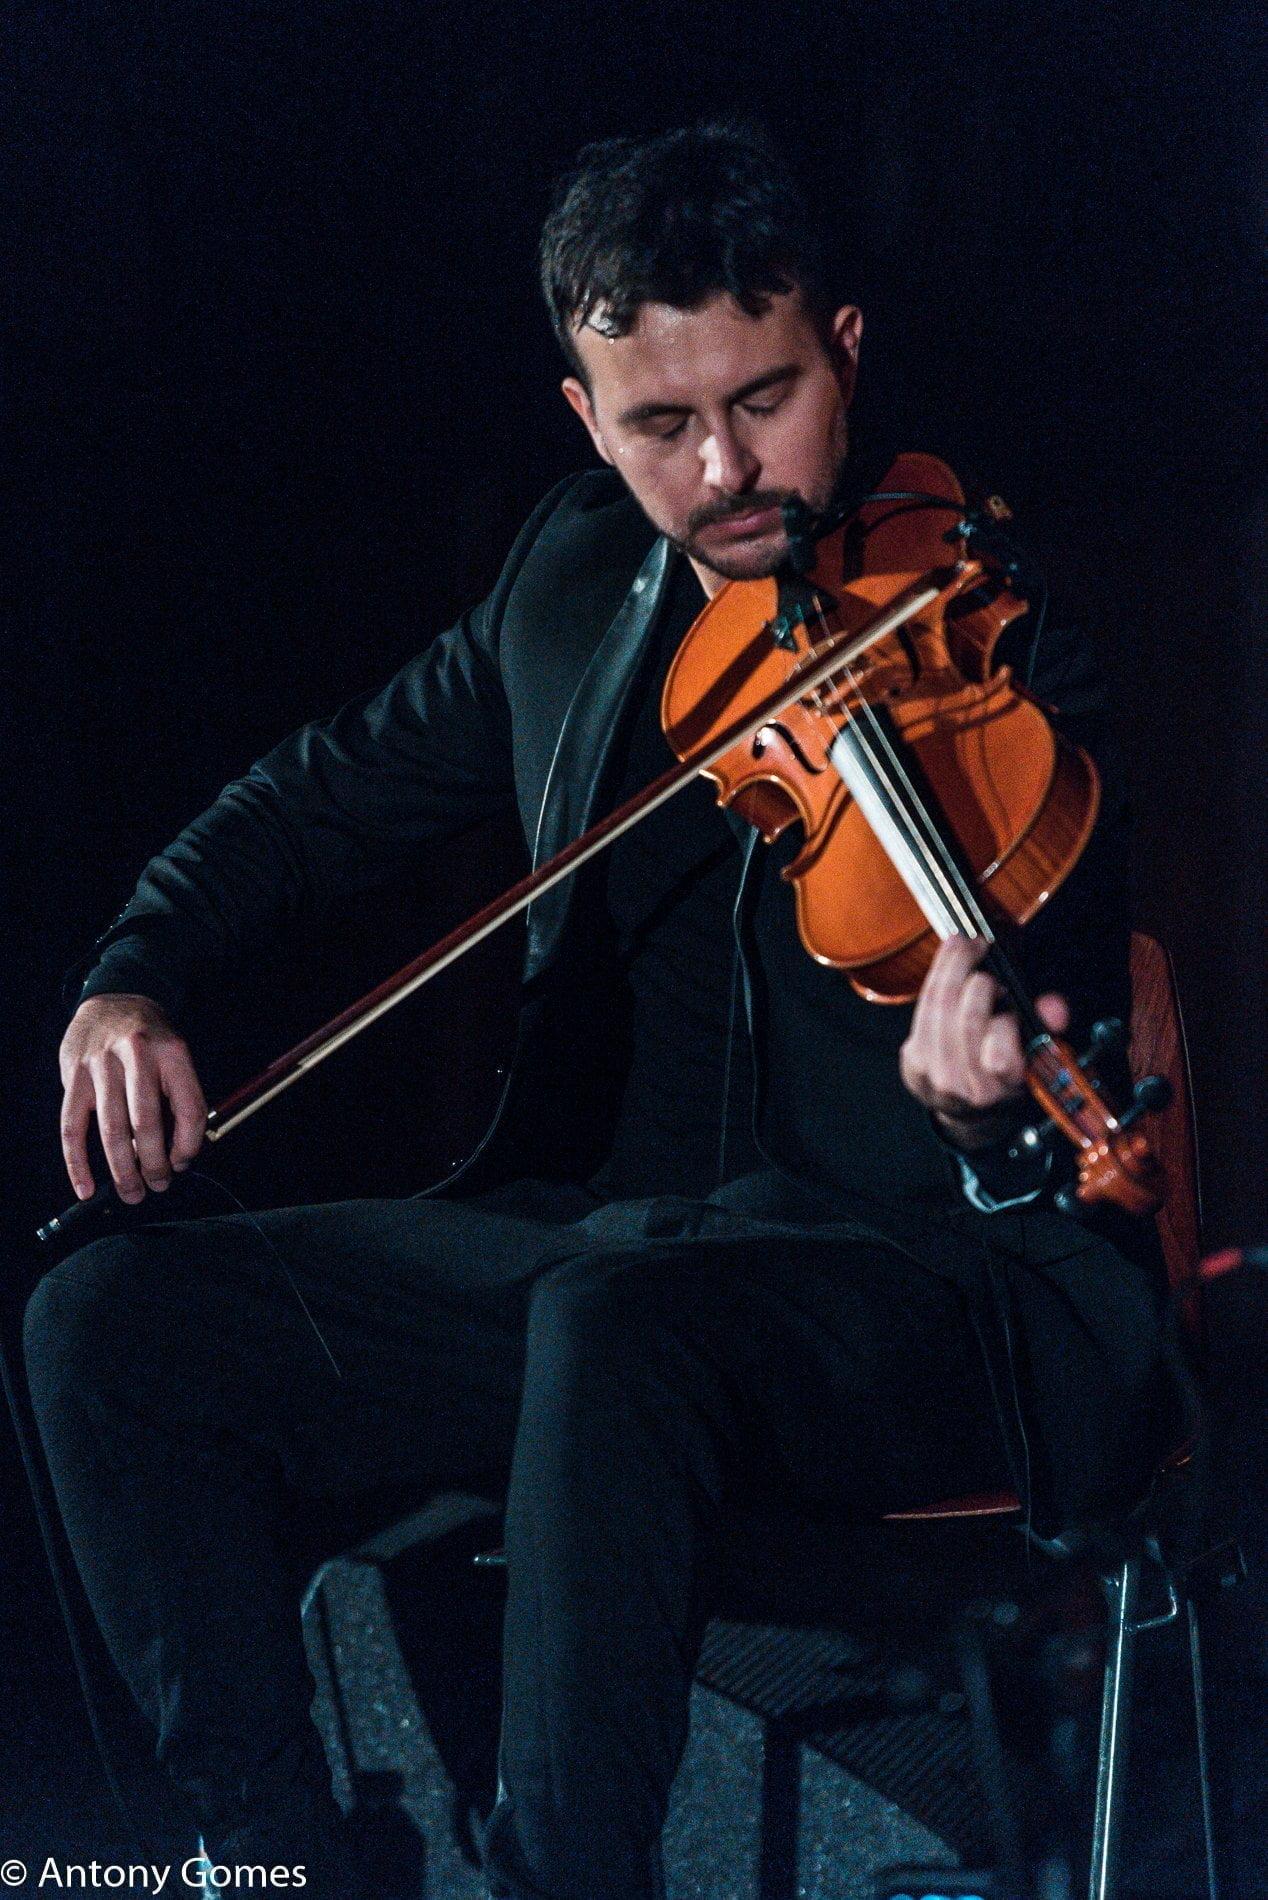 Luca d'Alberto MaMA Event